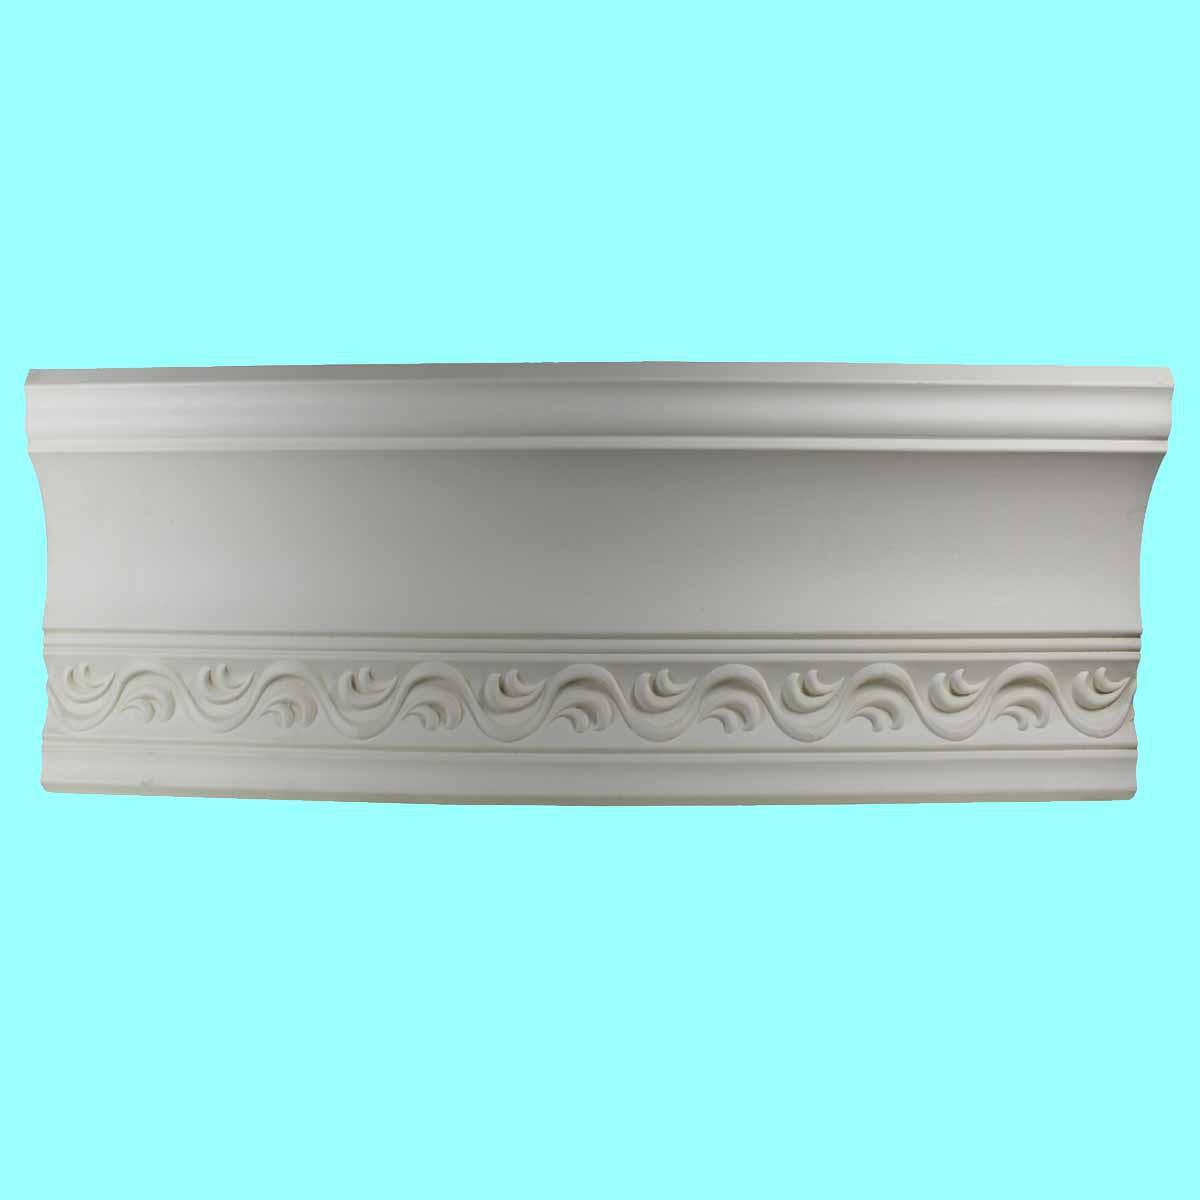 Cornice White Urethane Sample of 10987 23.75 Long Cornice Cornice Moulding Cornice Molding